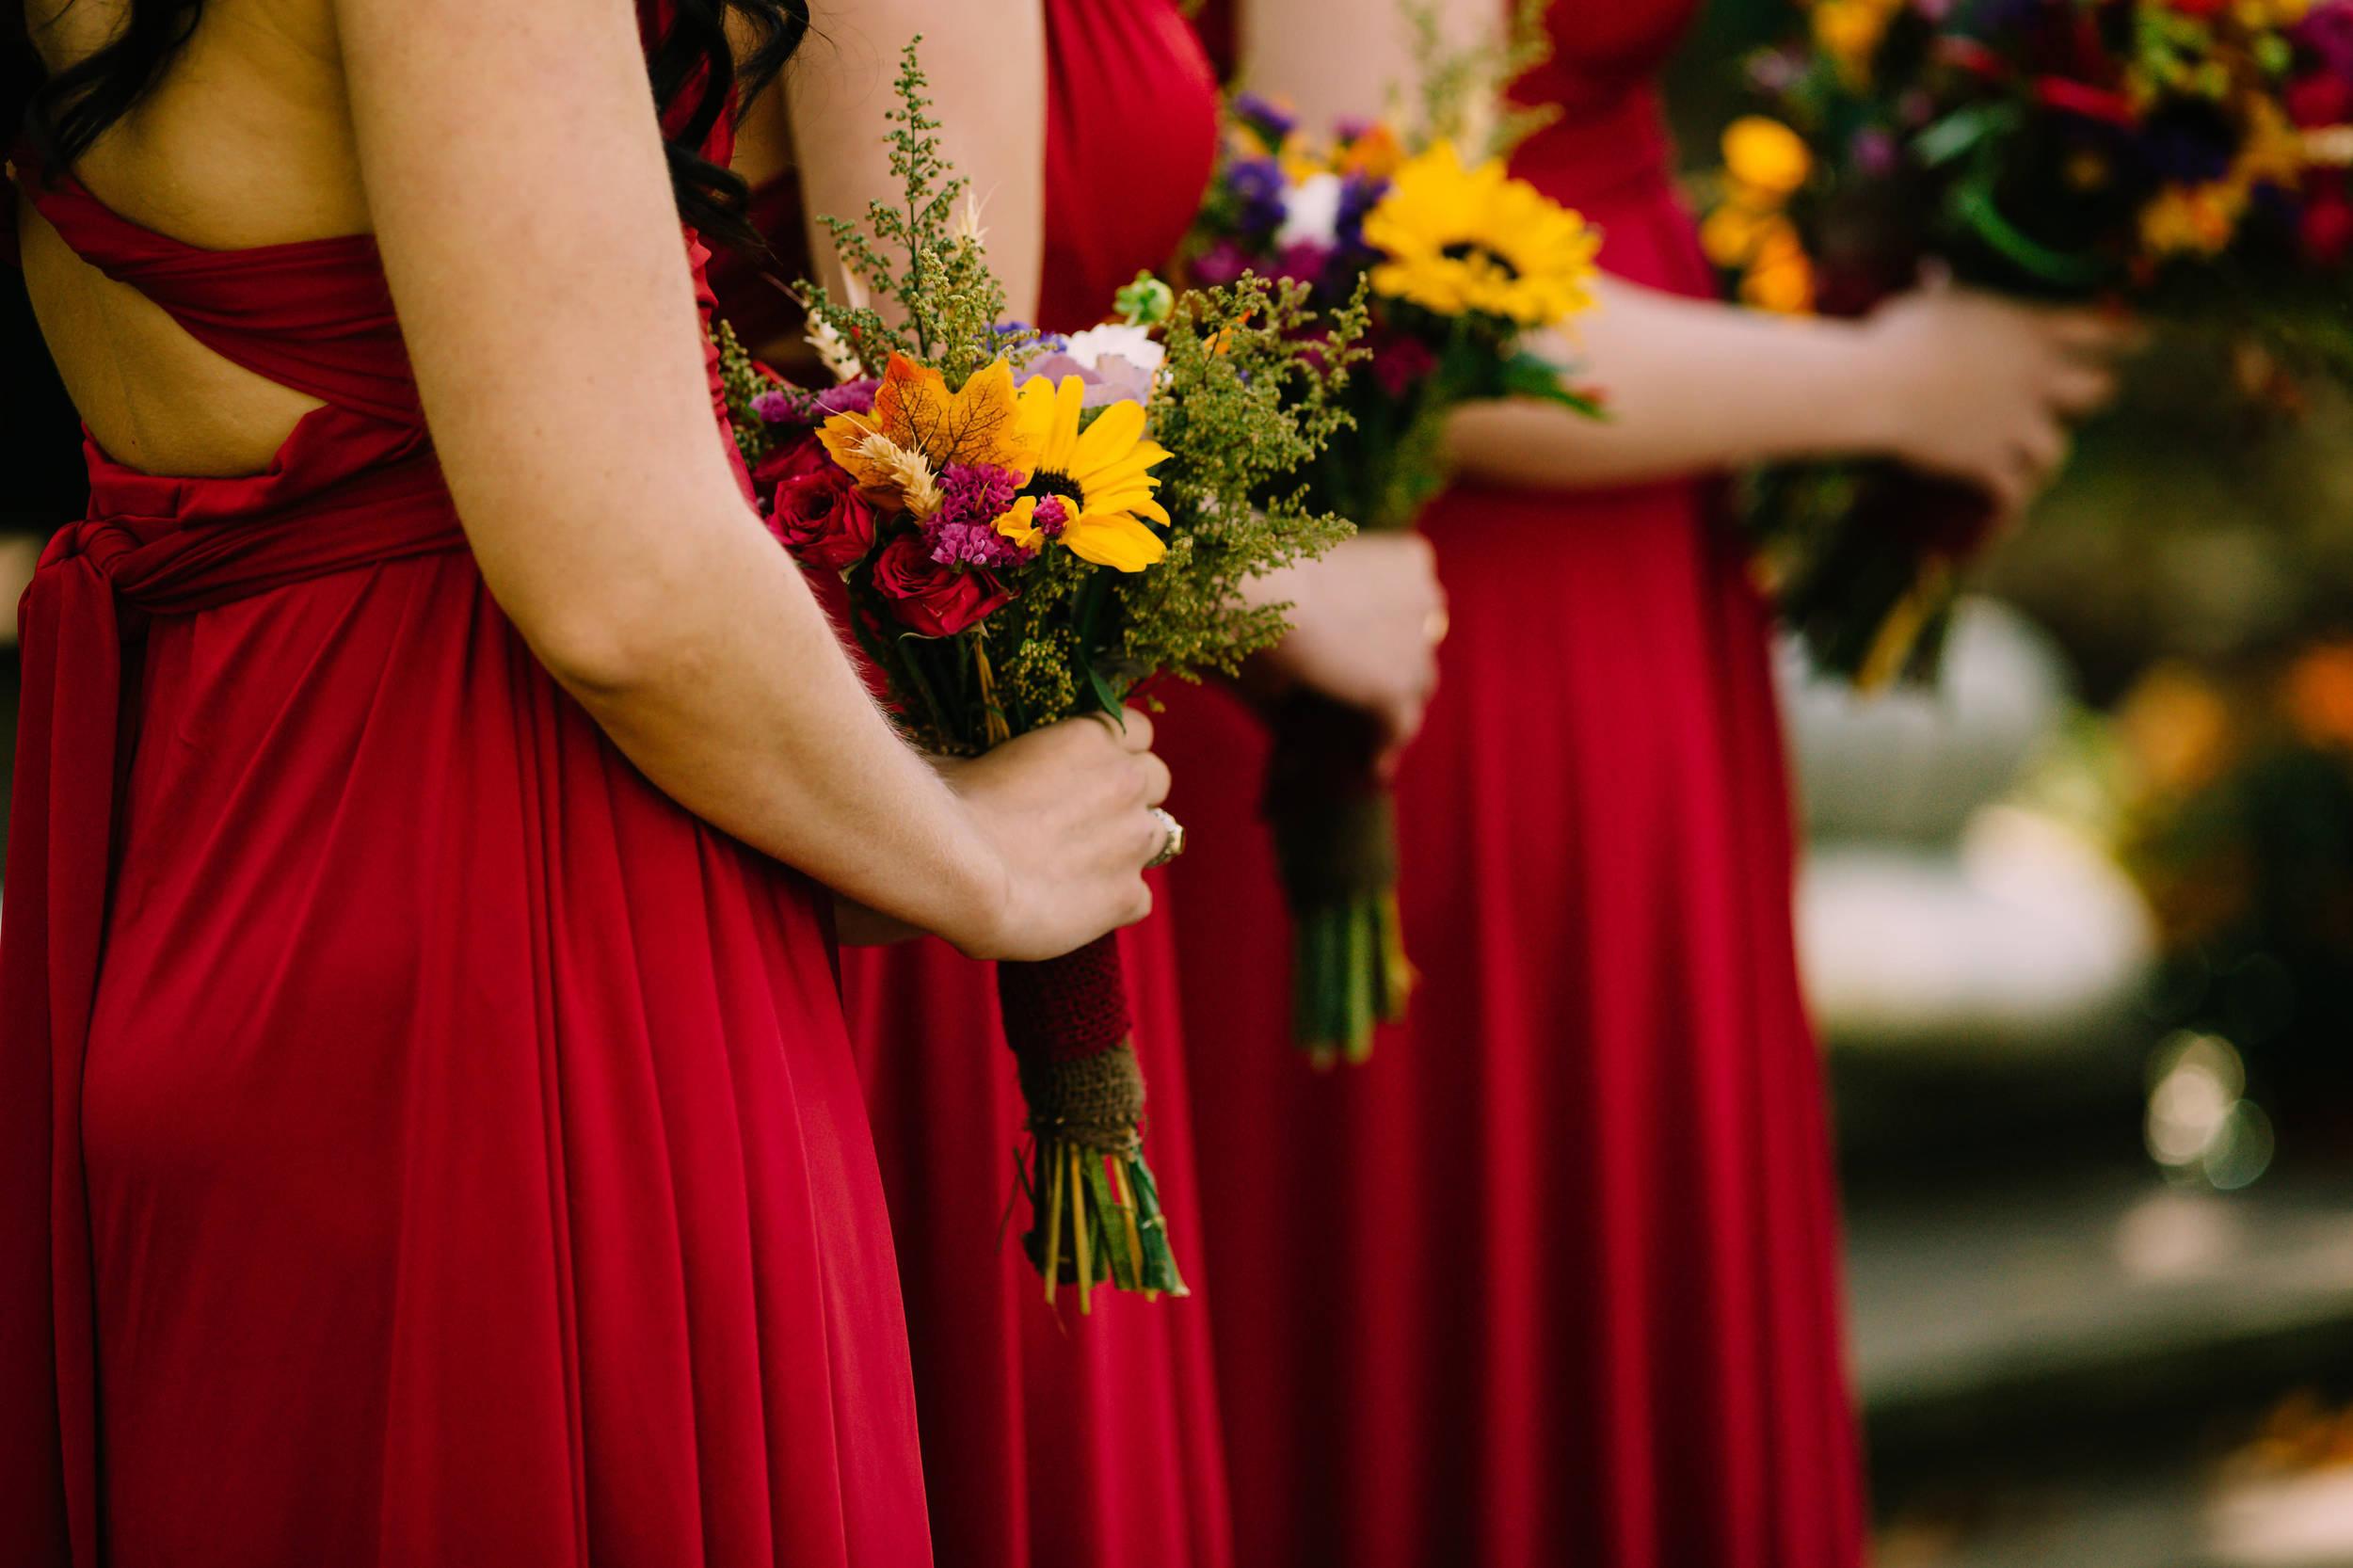 Beautiful bridesmaid bouquets for October wedding in Ohio